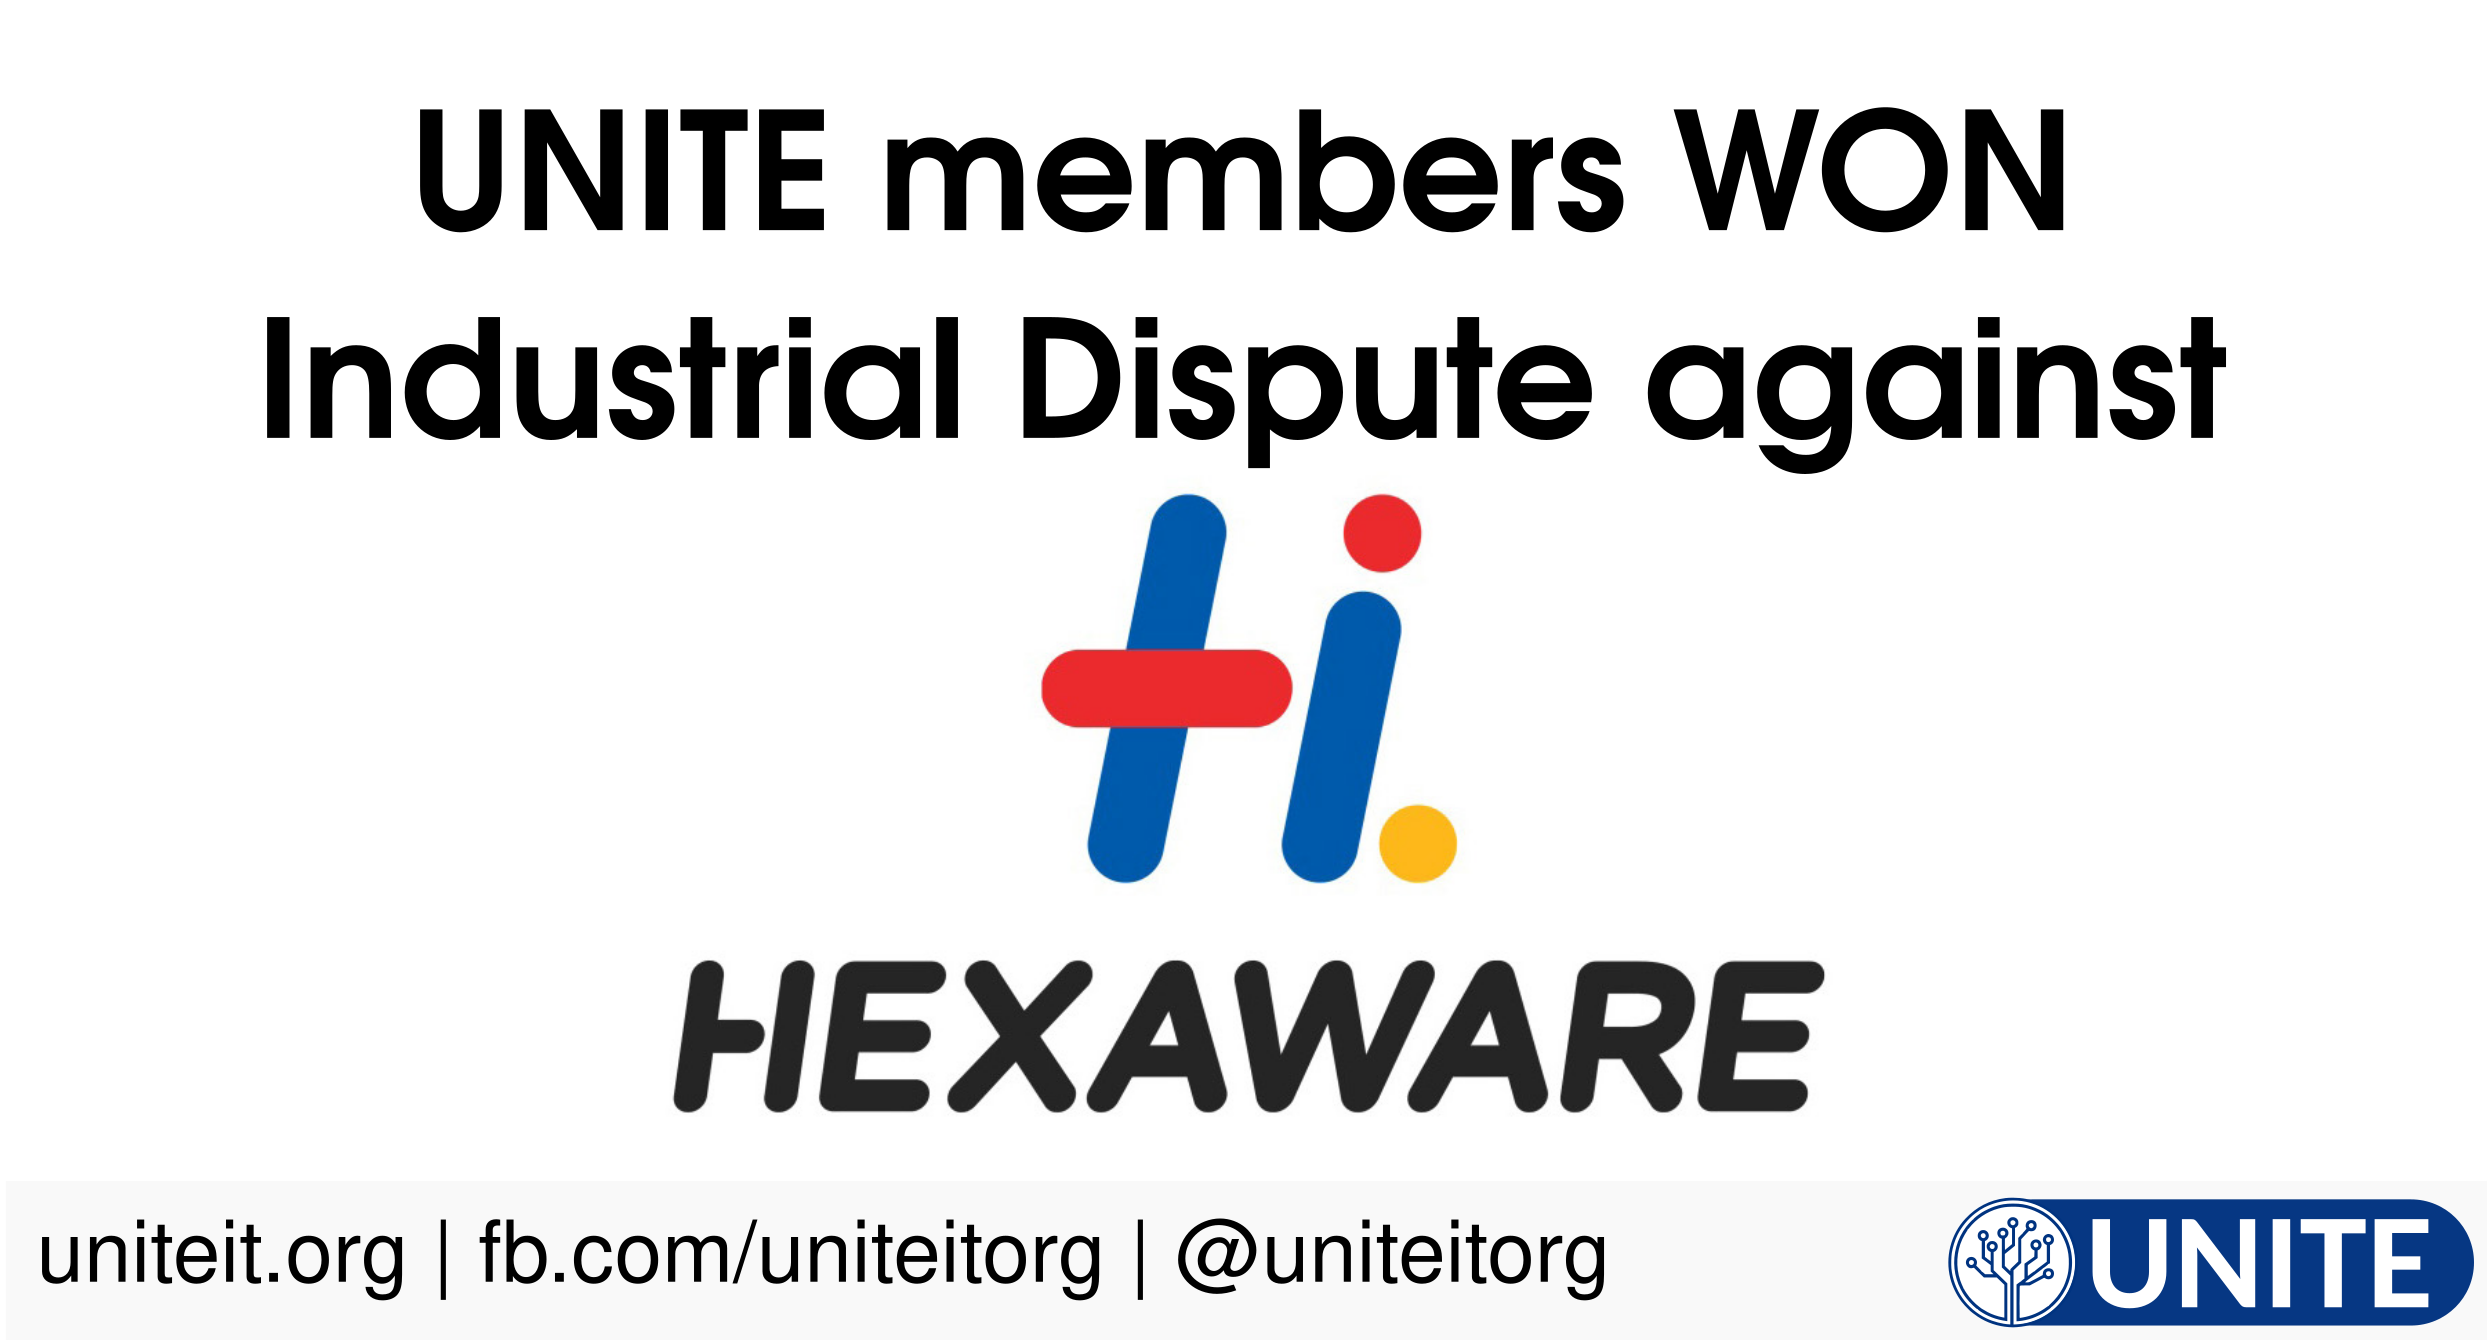 UNITE members won Industrial Dispute against Hexware